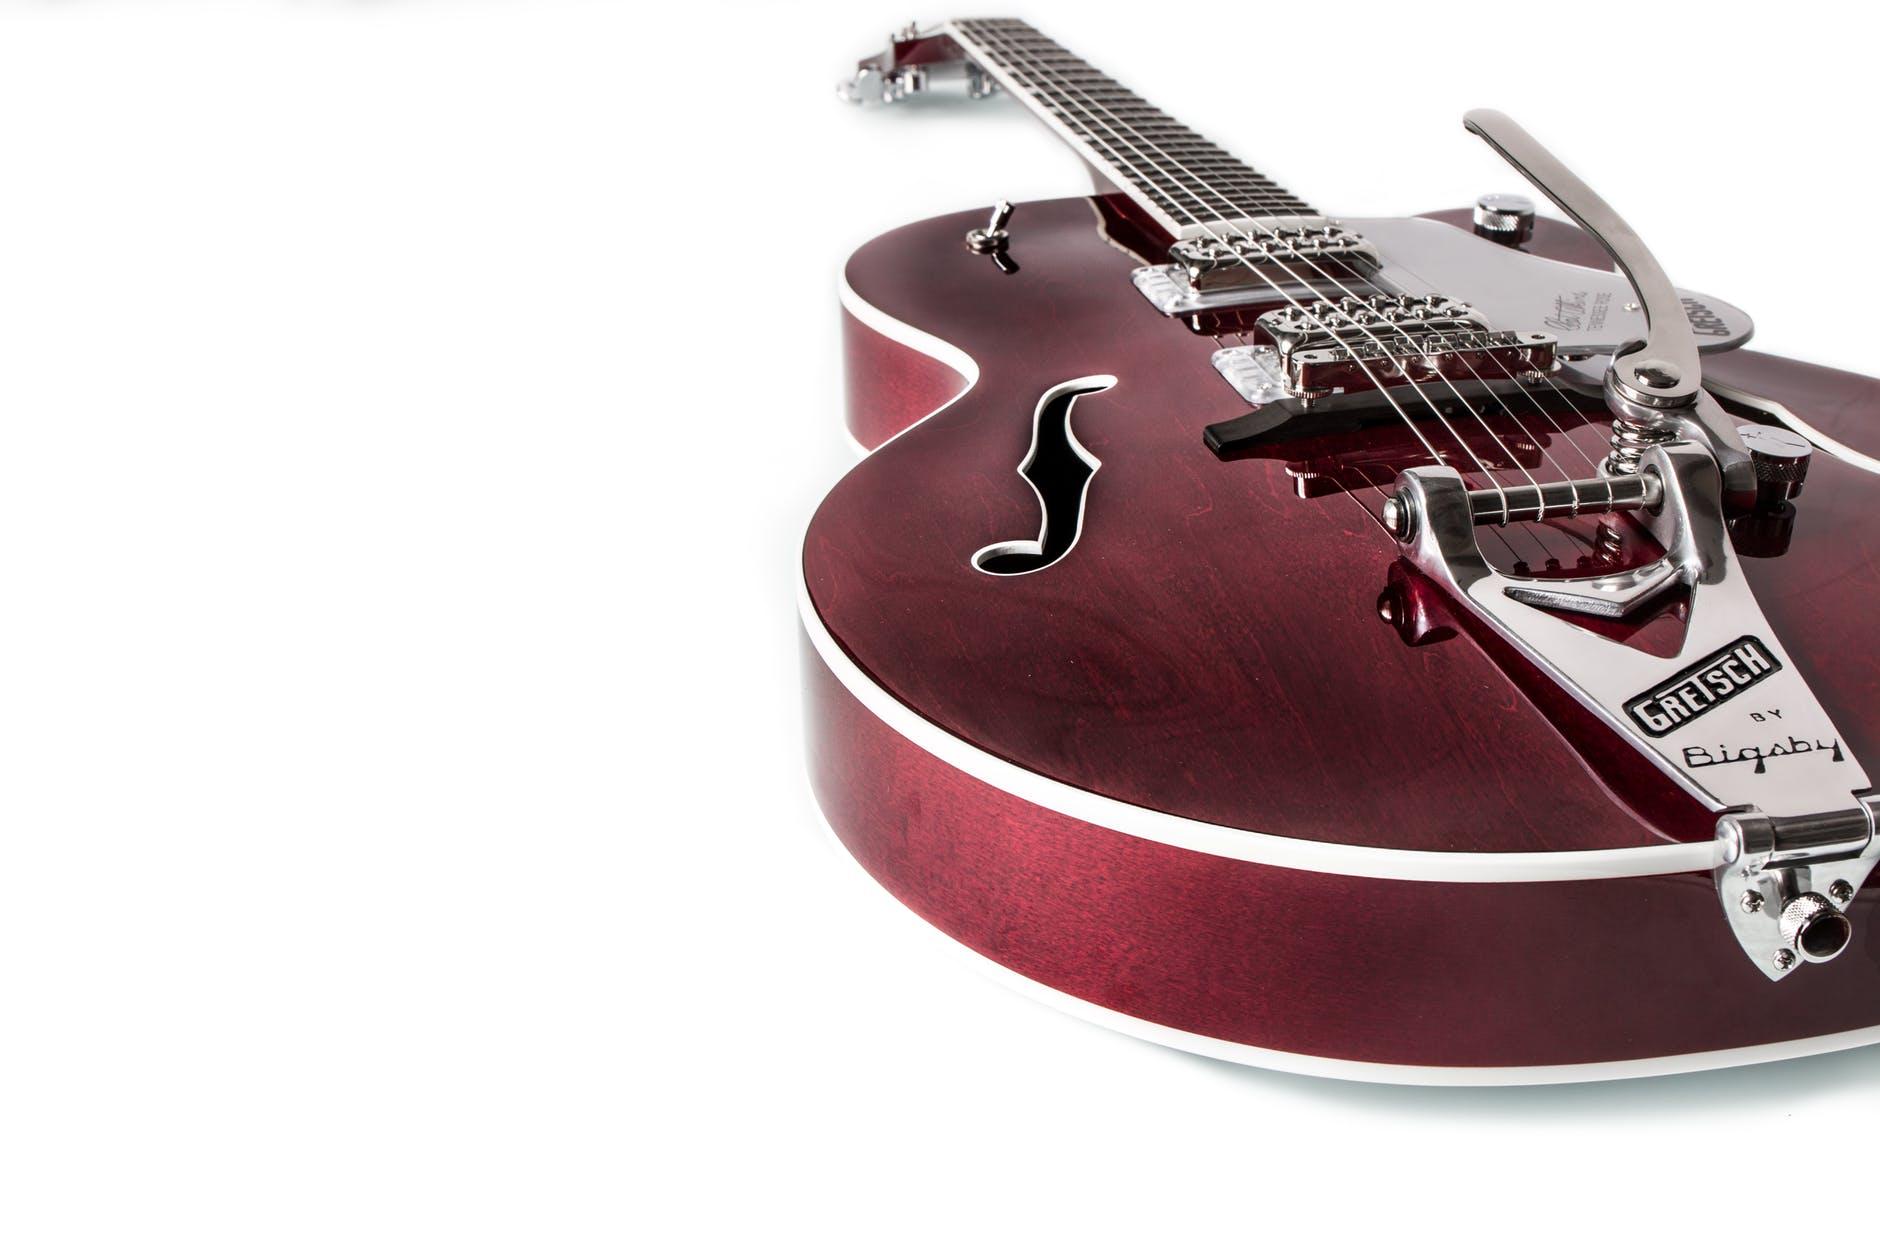 an electric guitar that has a vibrato bar